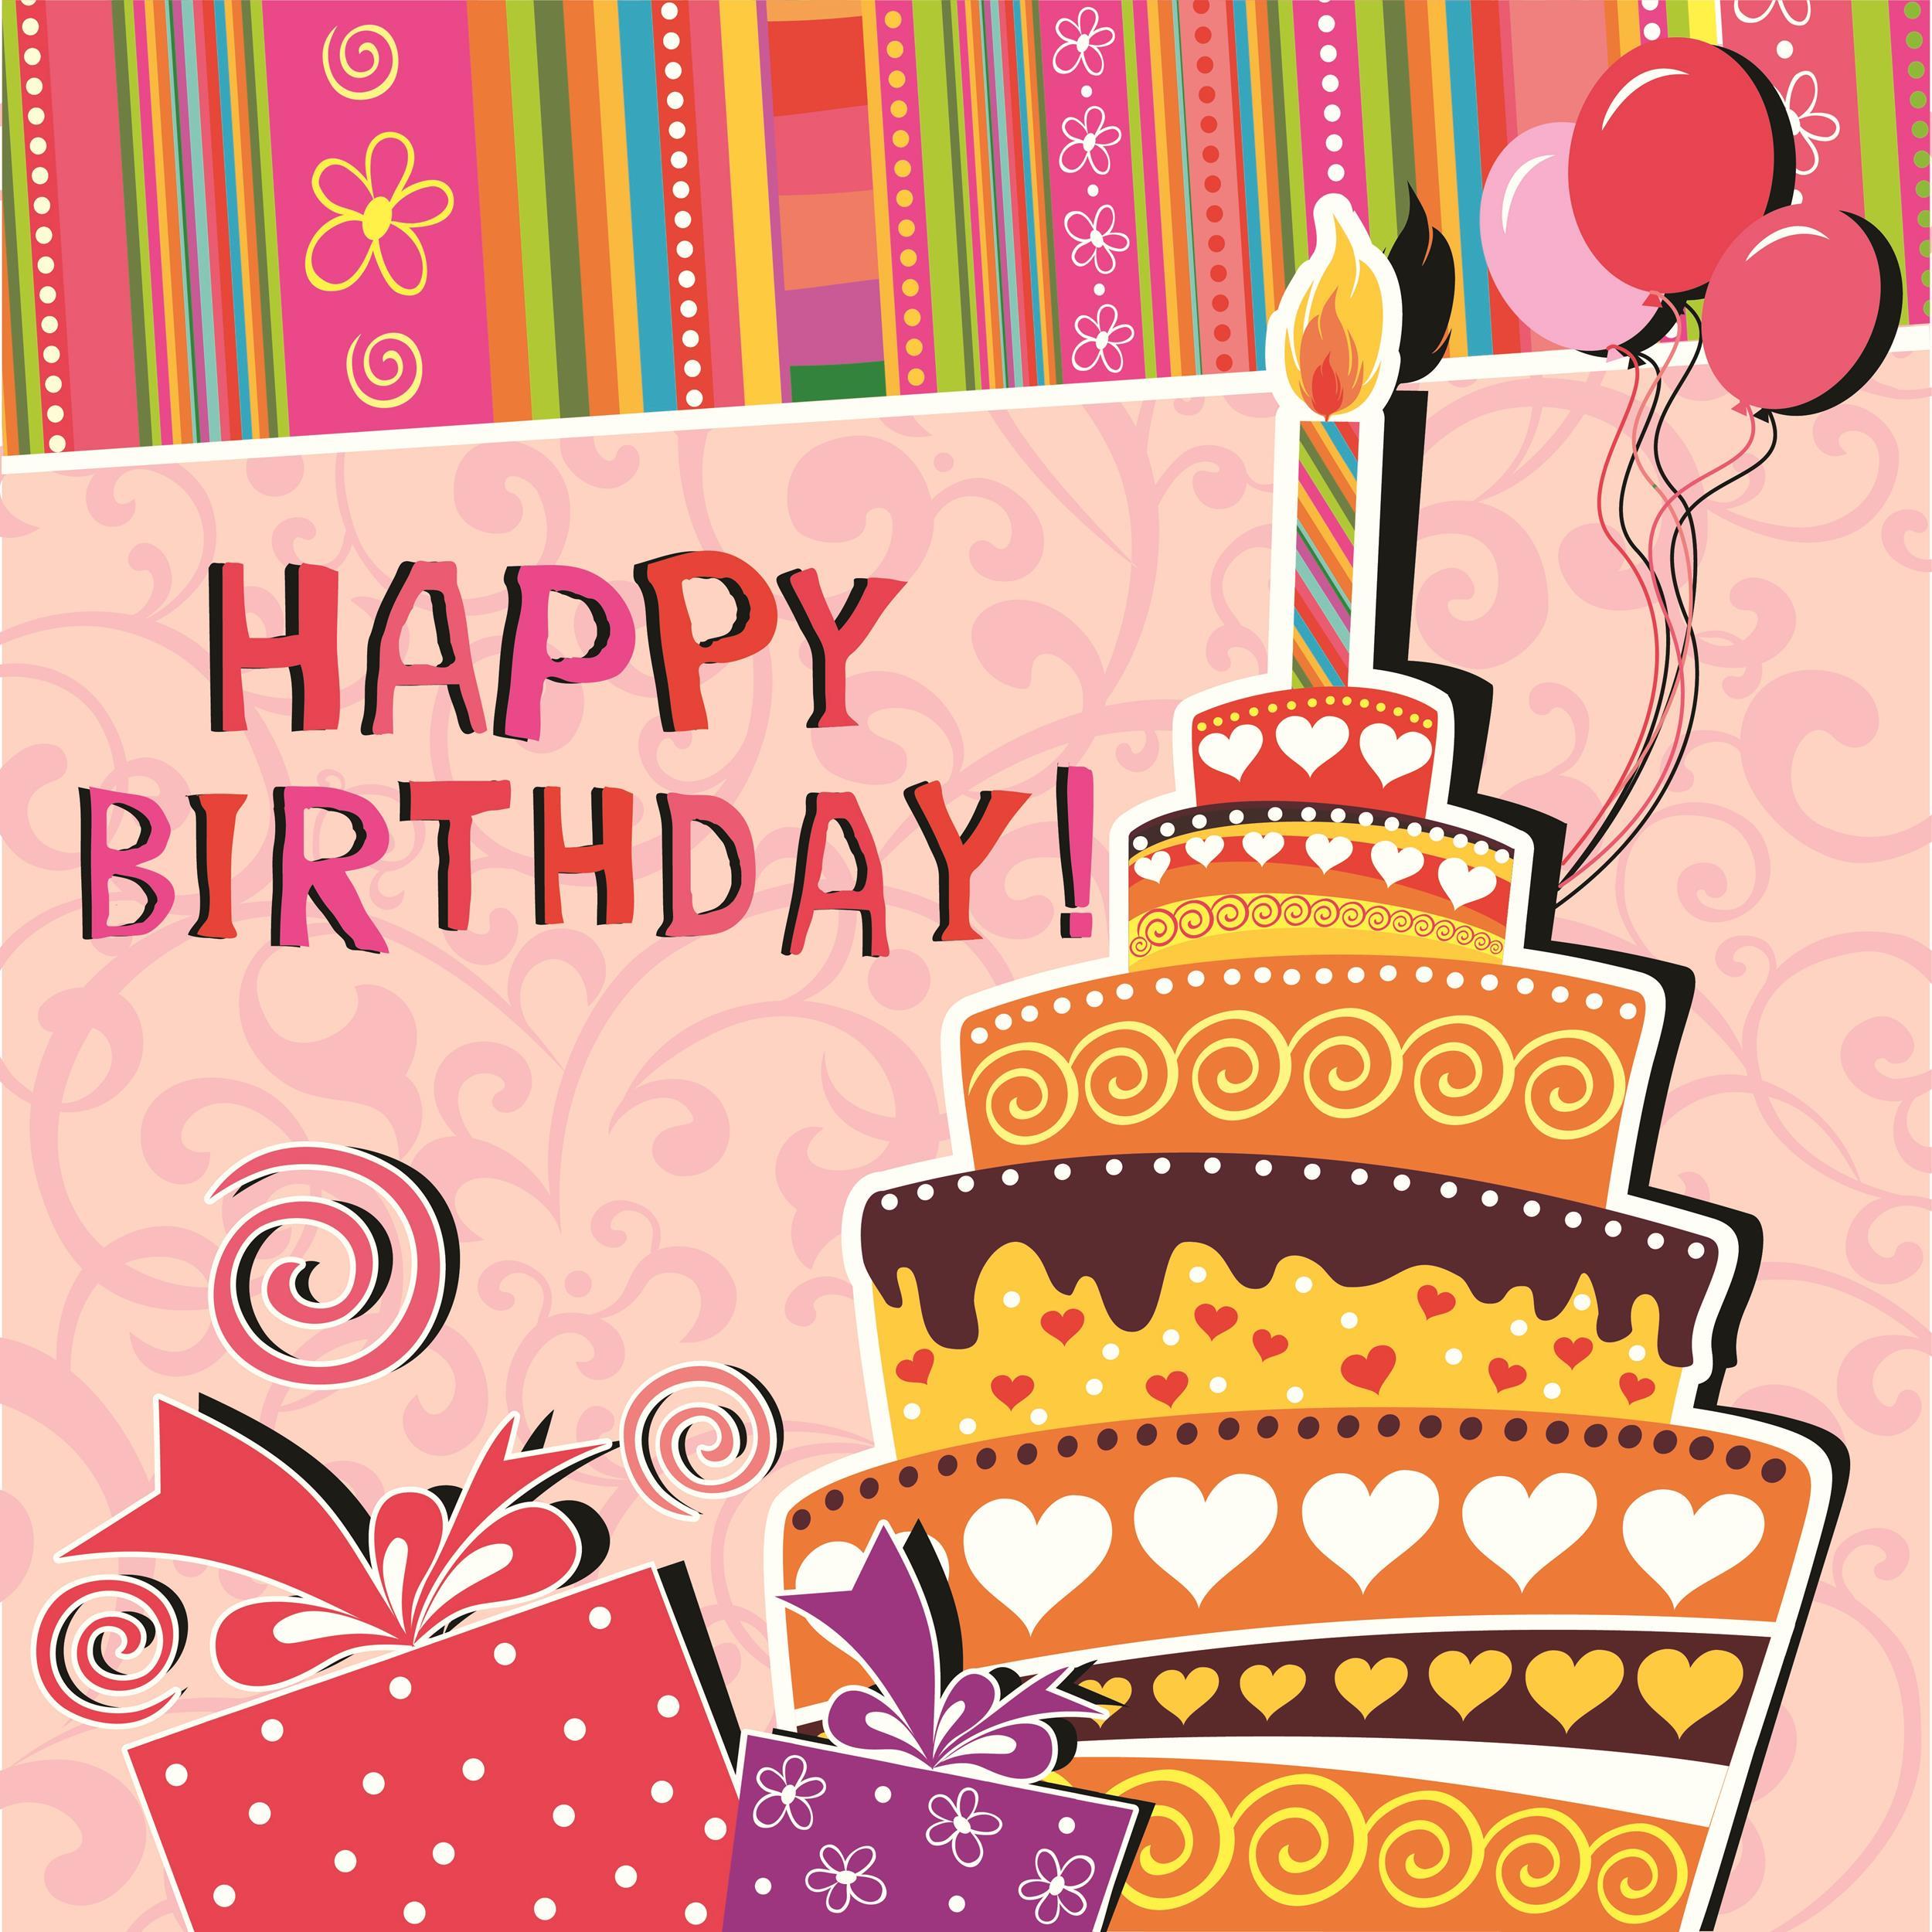 Pleasing 40 Free Birthday Card Templates Templatelab Funny Birthday Cards Online Fluifree Goldxyz